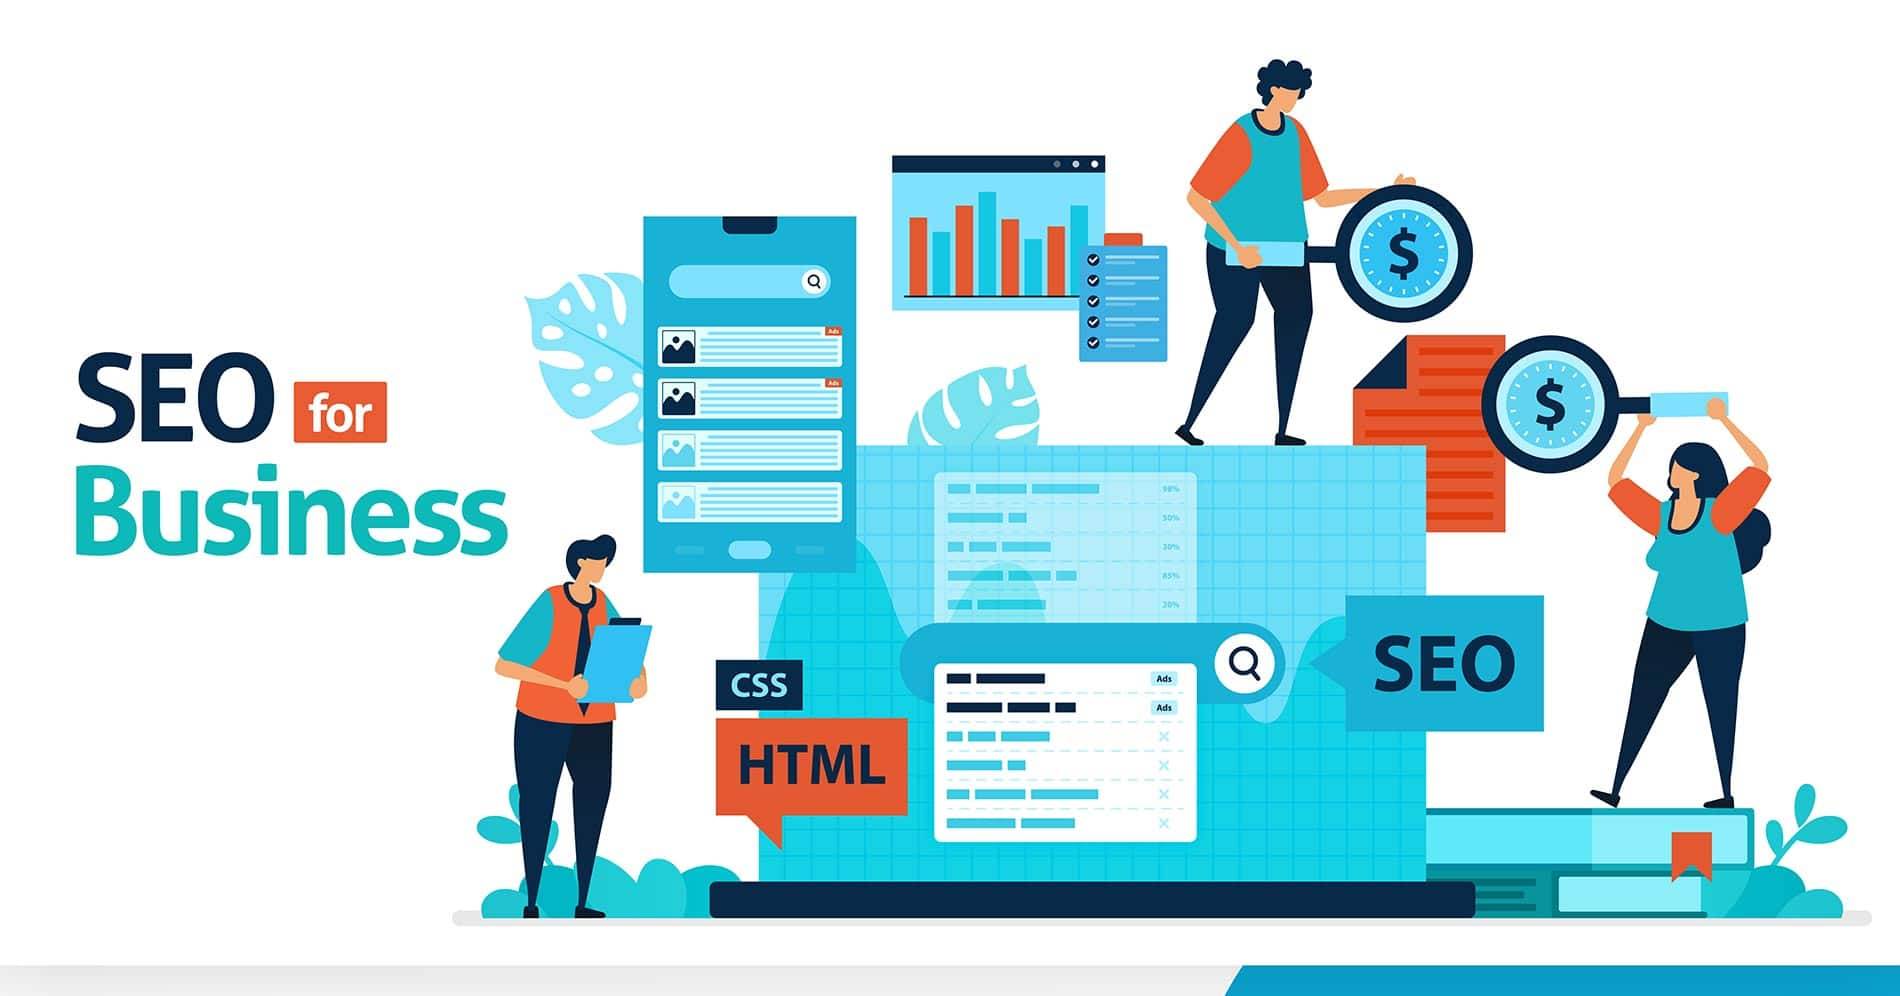 Business marketing optimization with SEO